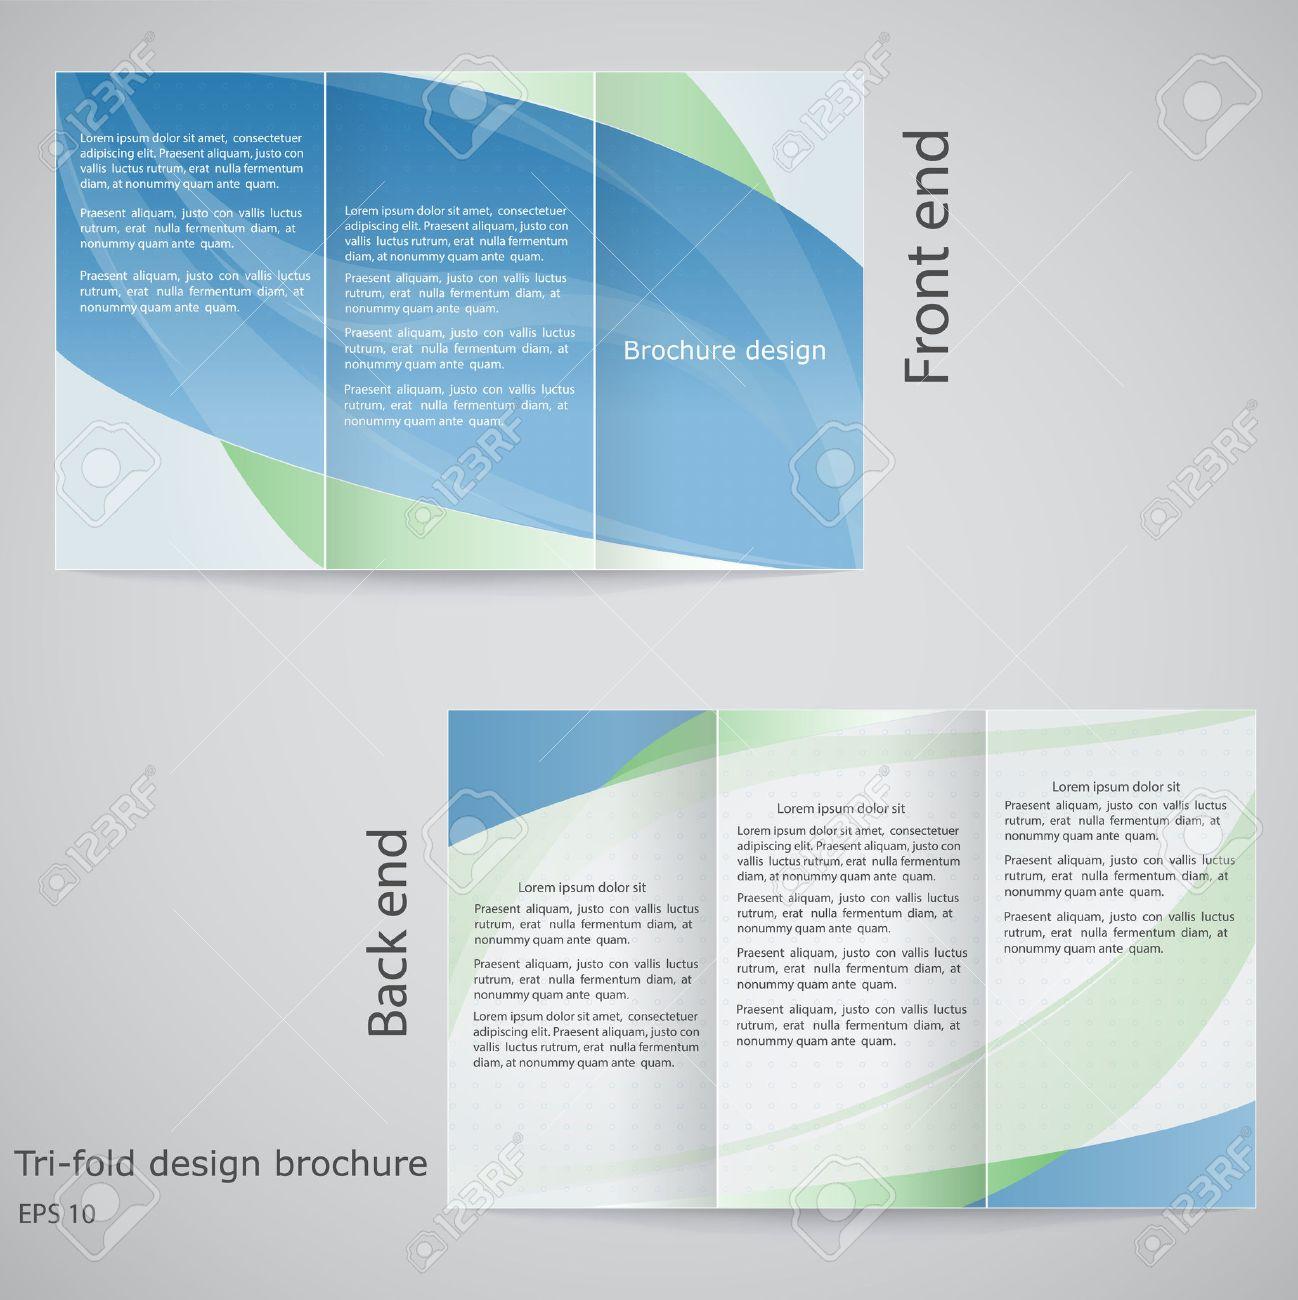 Tri-fold Brochure Design. Brochure Template Design In Shades ...